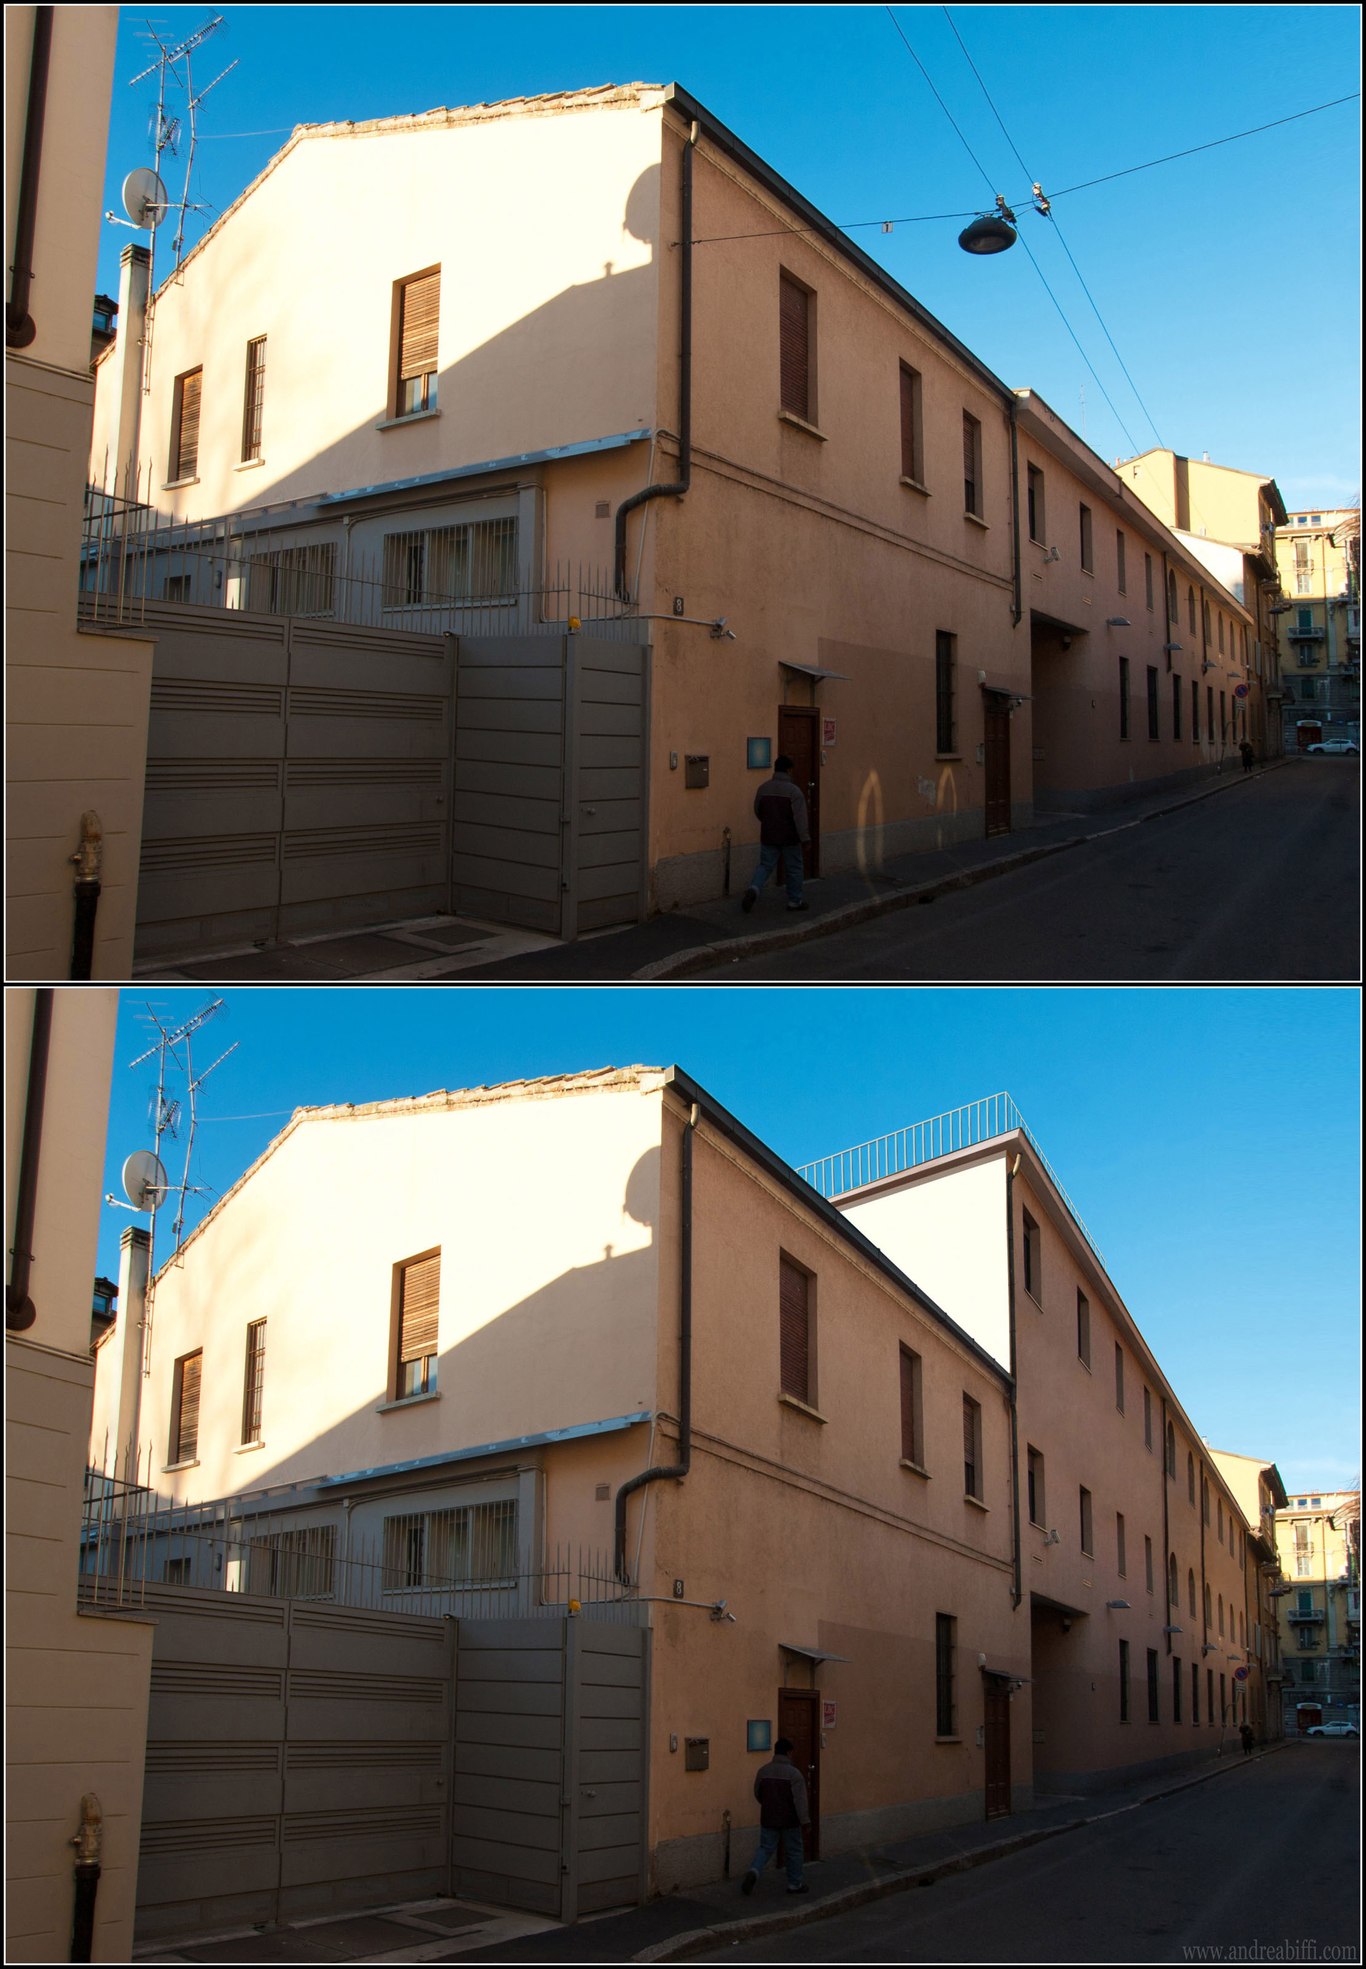 Deda photorealistic urban 1 fcc1f9bf mxj9